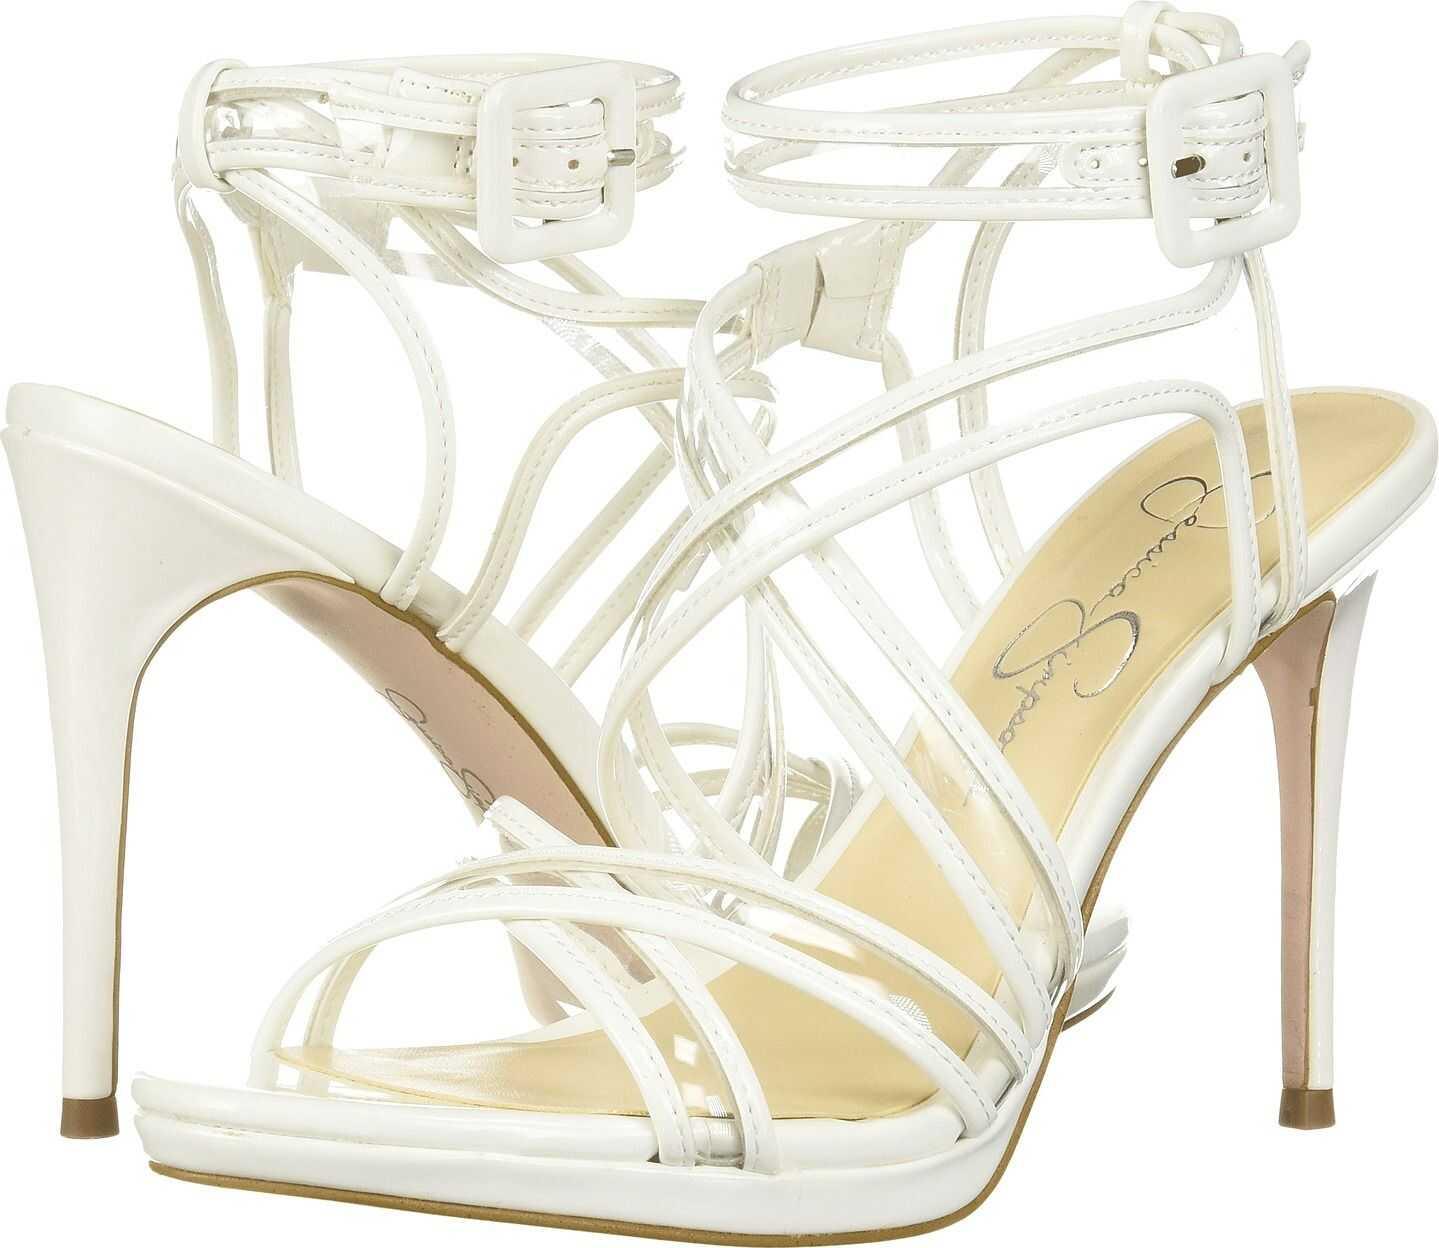 Jessica Simpson Kendele 2 Bright White